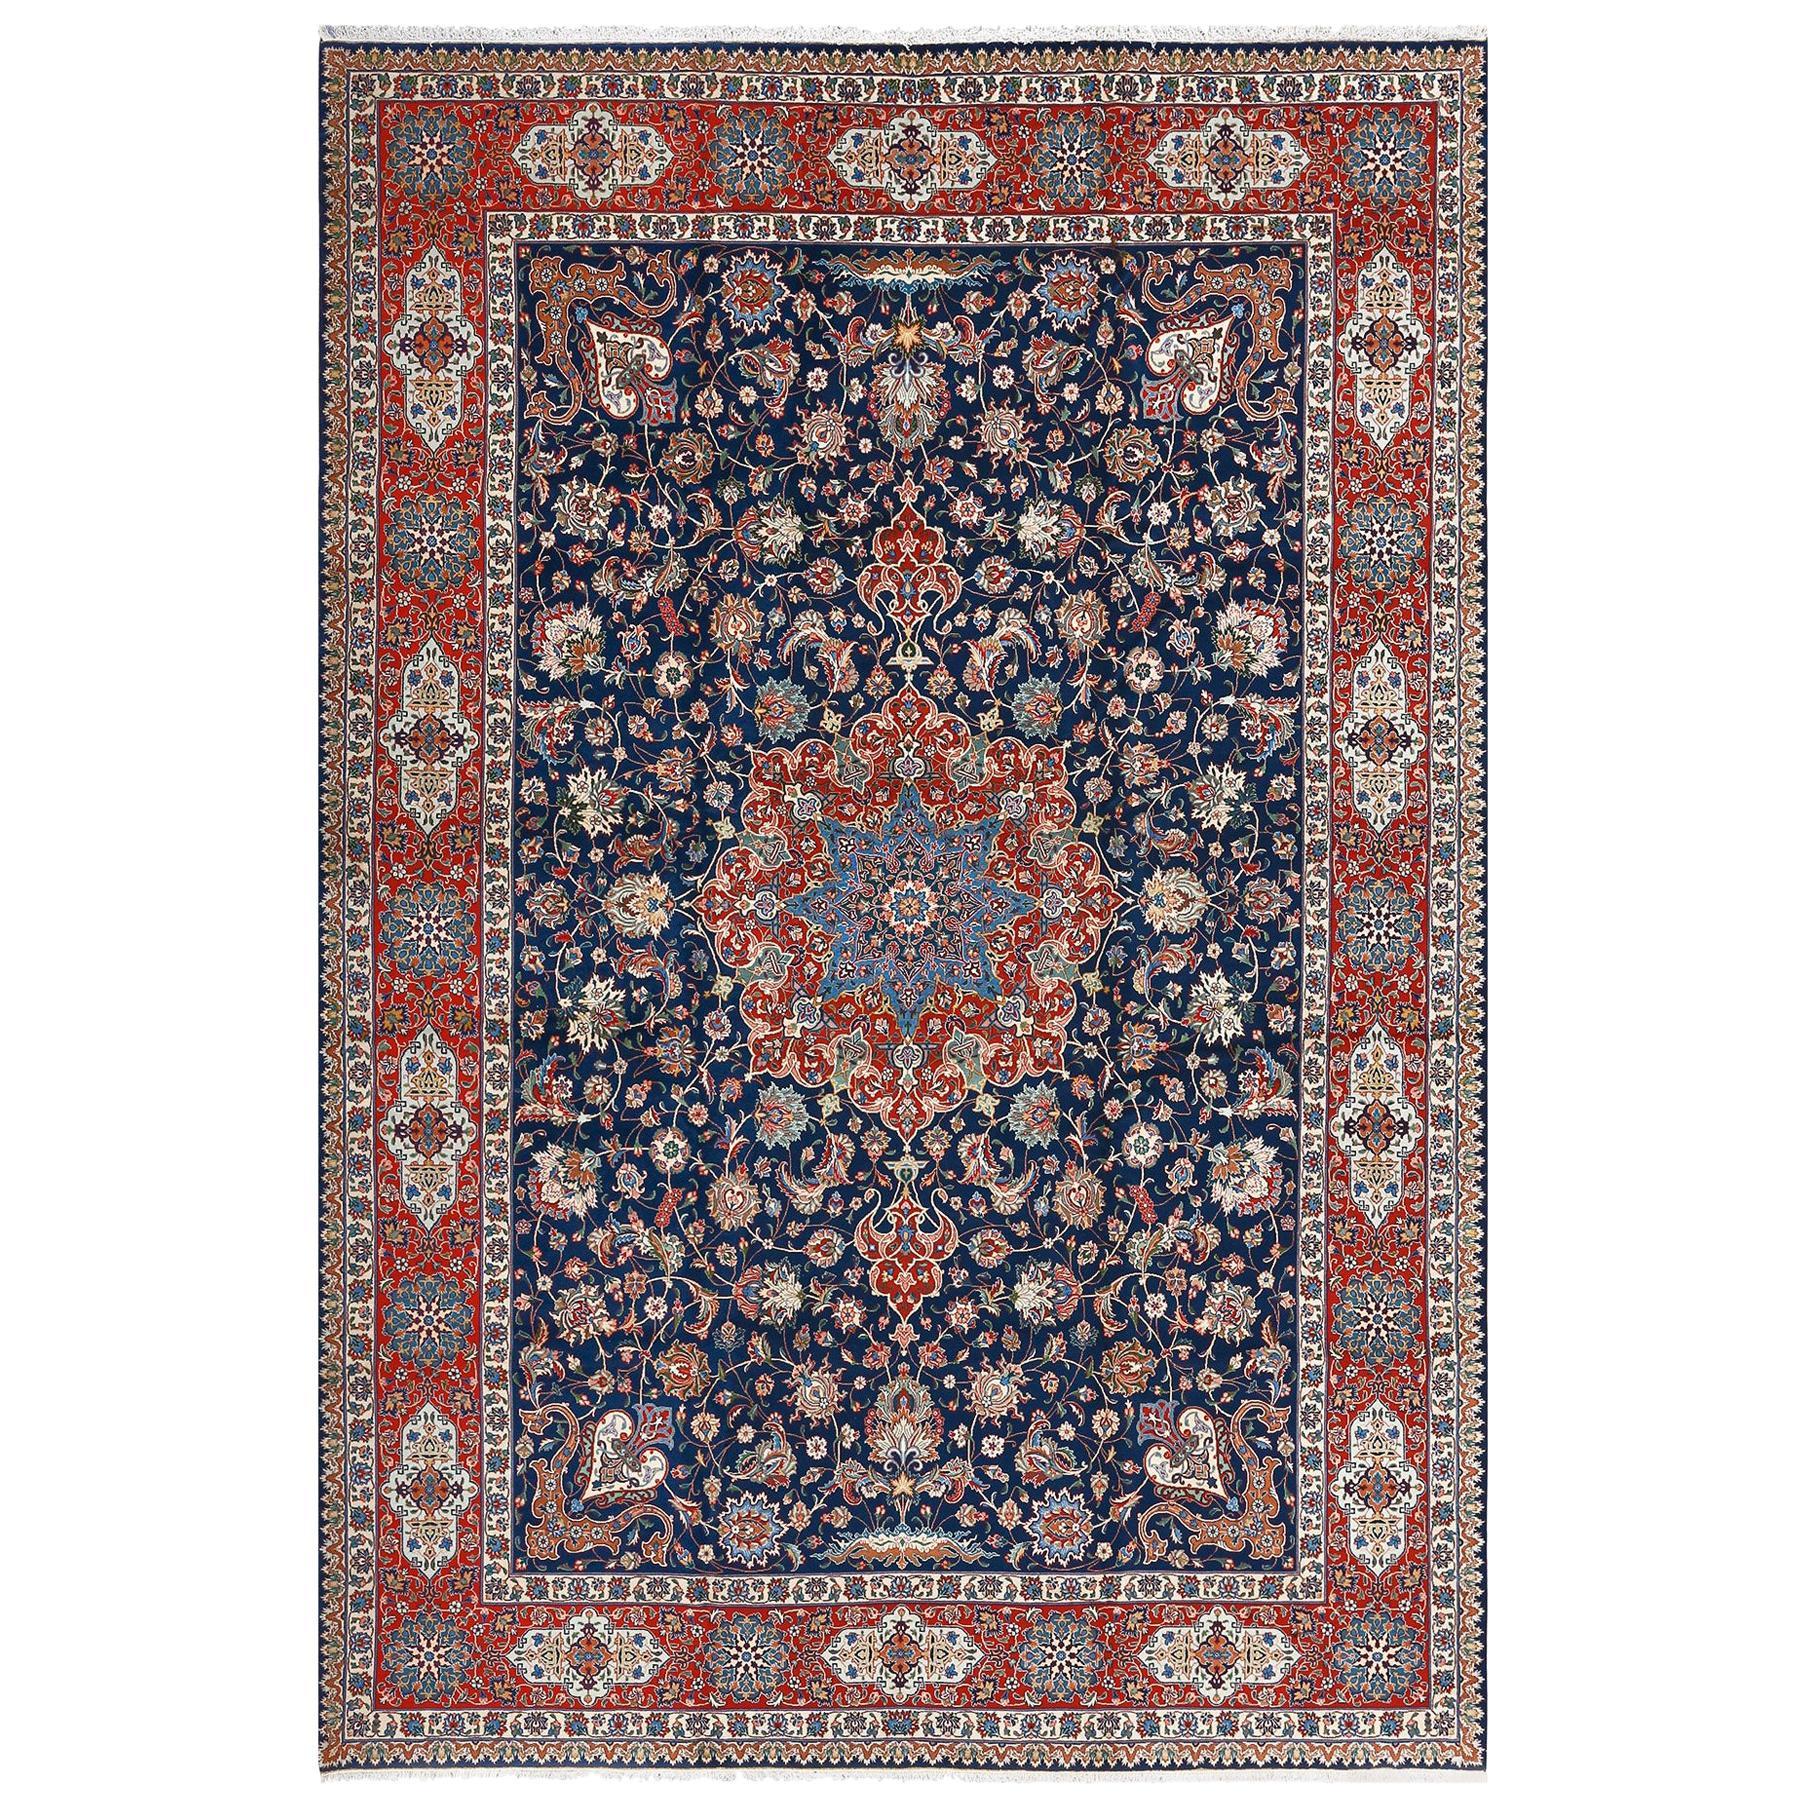 Fine Navy Background Vintage Tabriz Persian Rug. Size: 8 ft 3 in x 12 ft